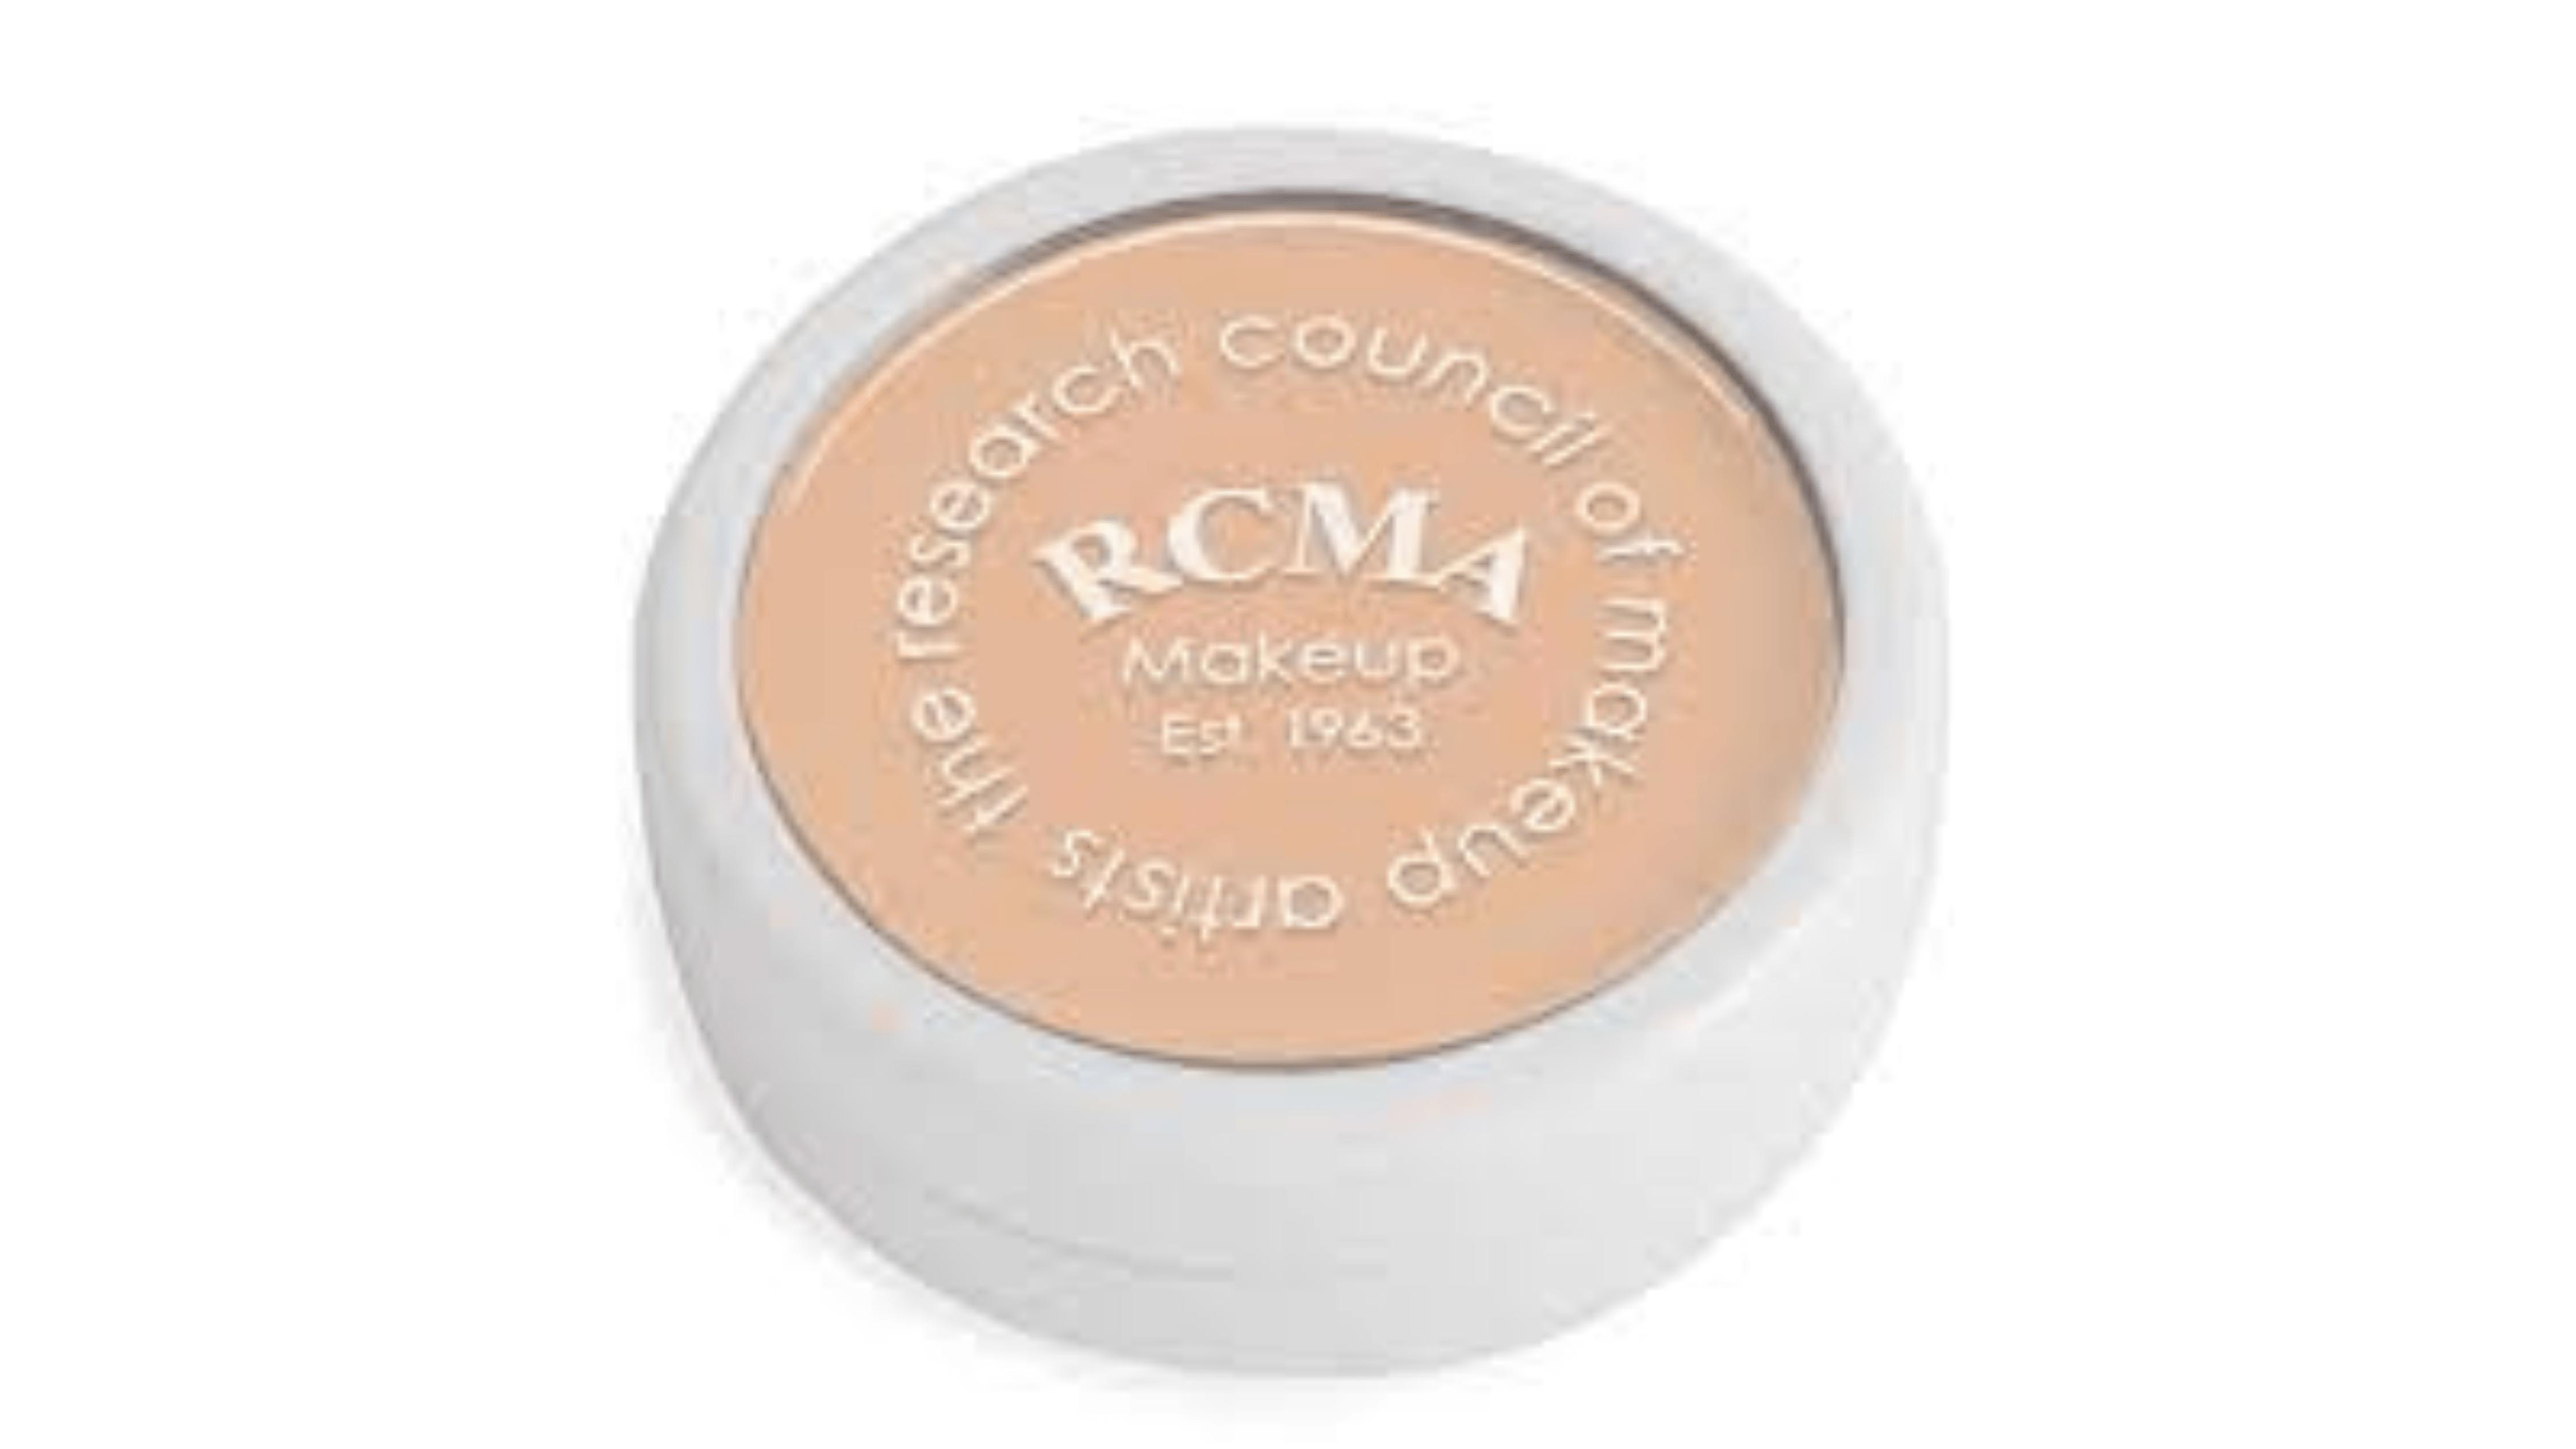 RCMA foundation vegan foundations